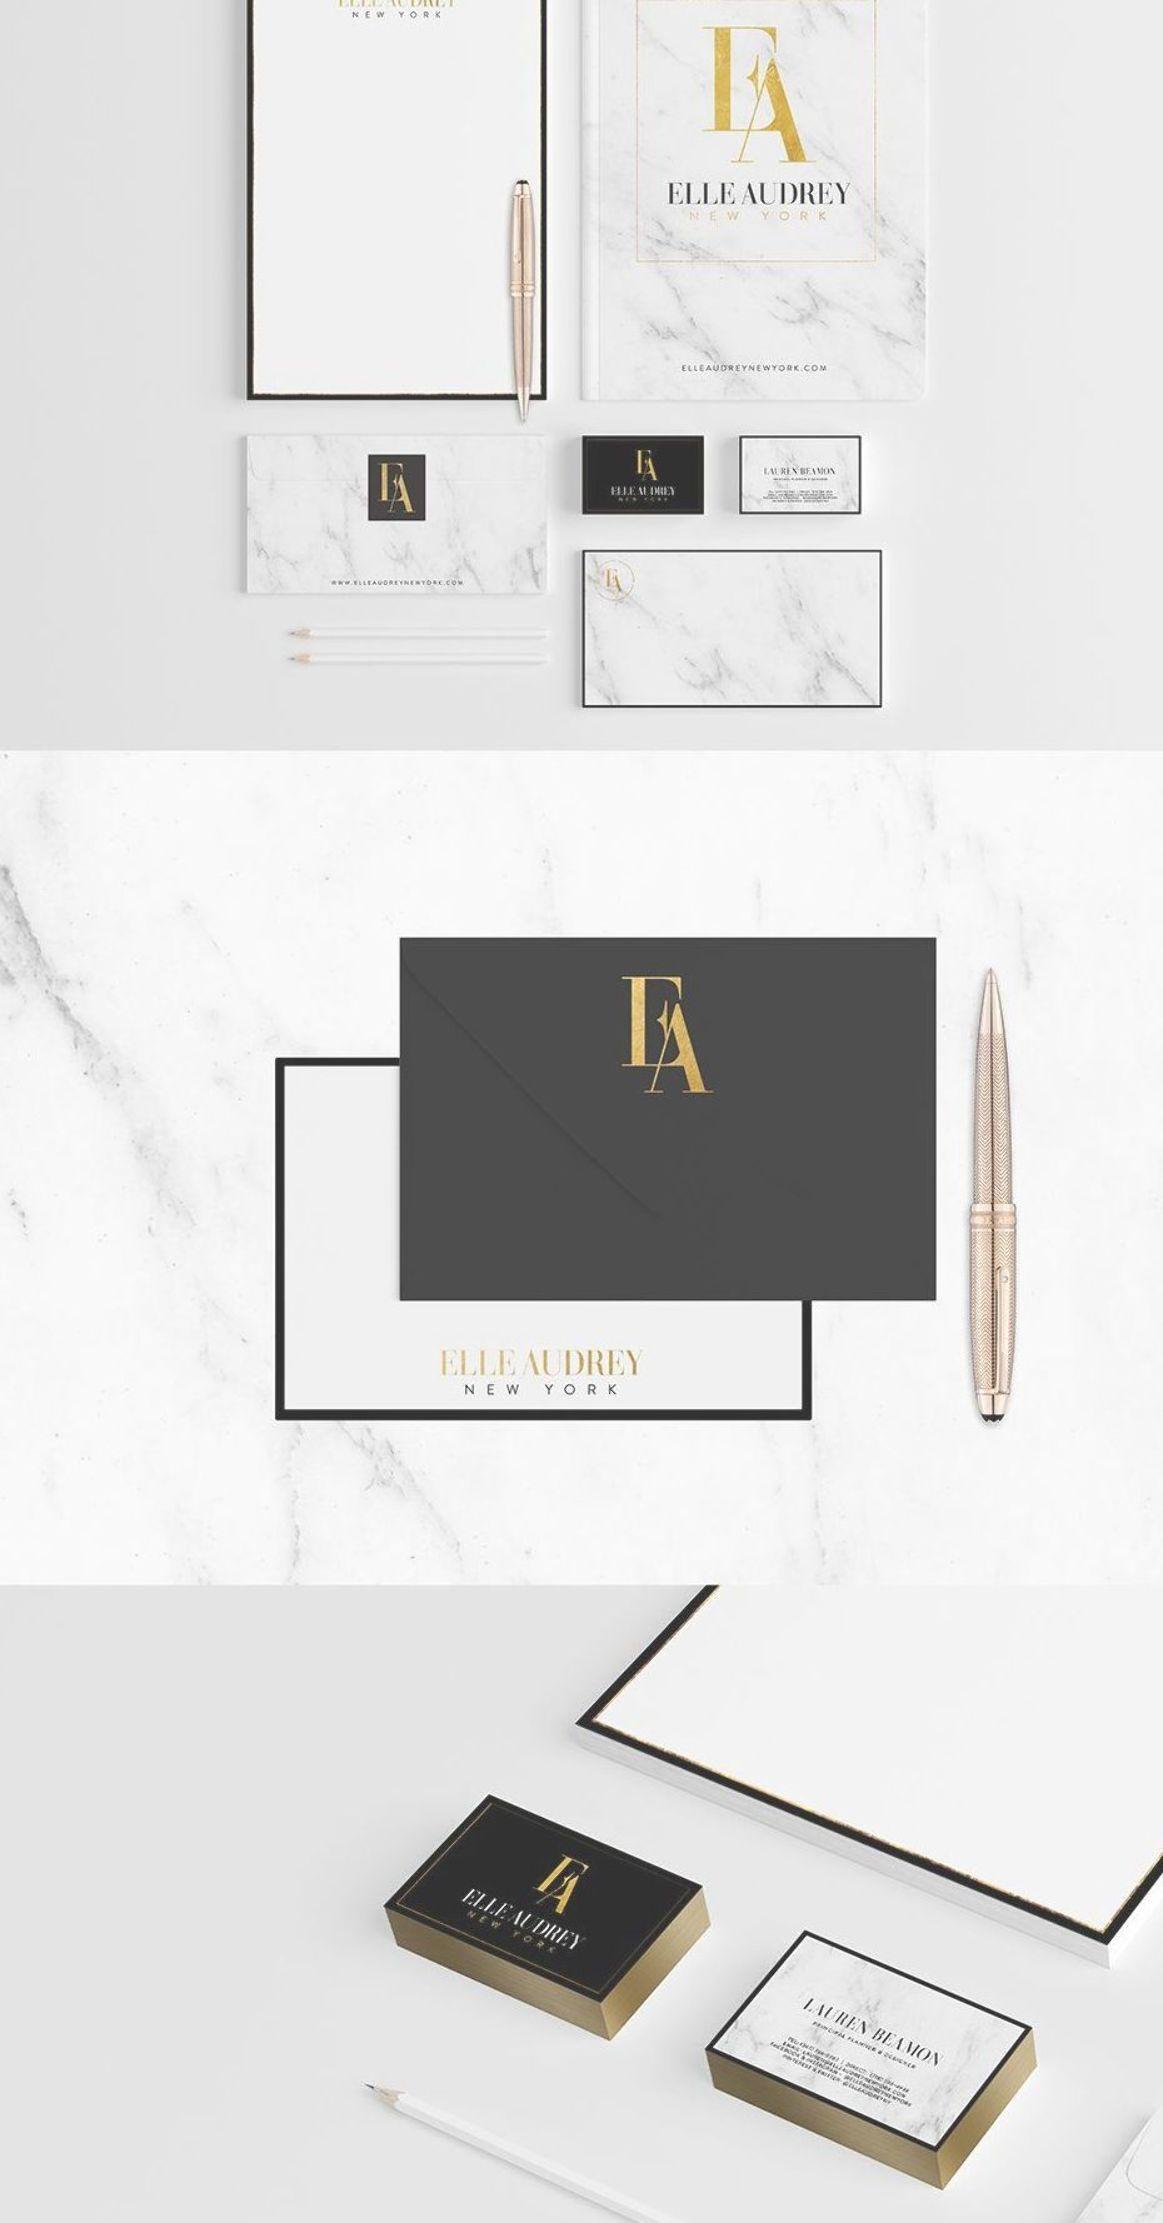 Business Branding Luxury Brand Design Gold Foil And Marble Brand Stationery Design For Elle Audre Luxury Branding Design Stationery Branding Branding Design